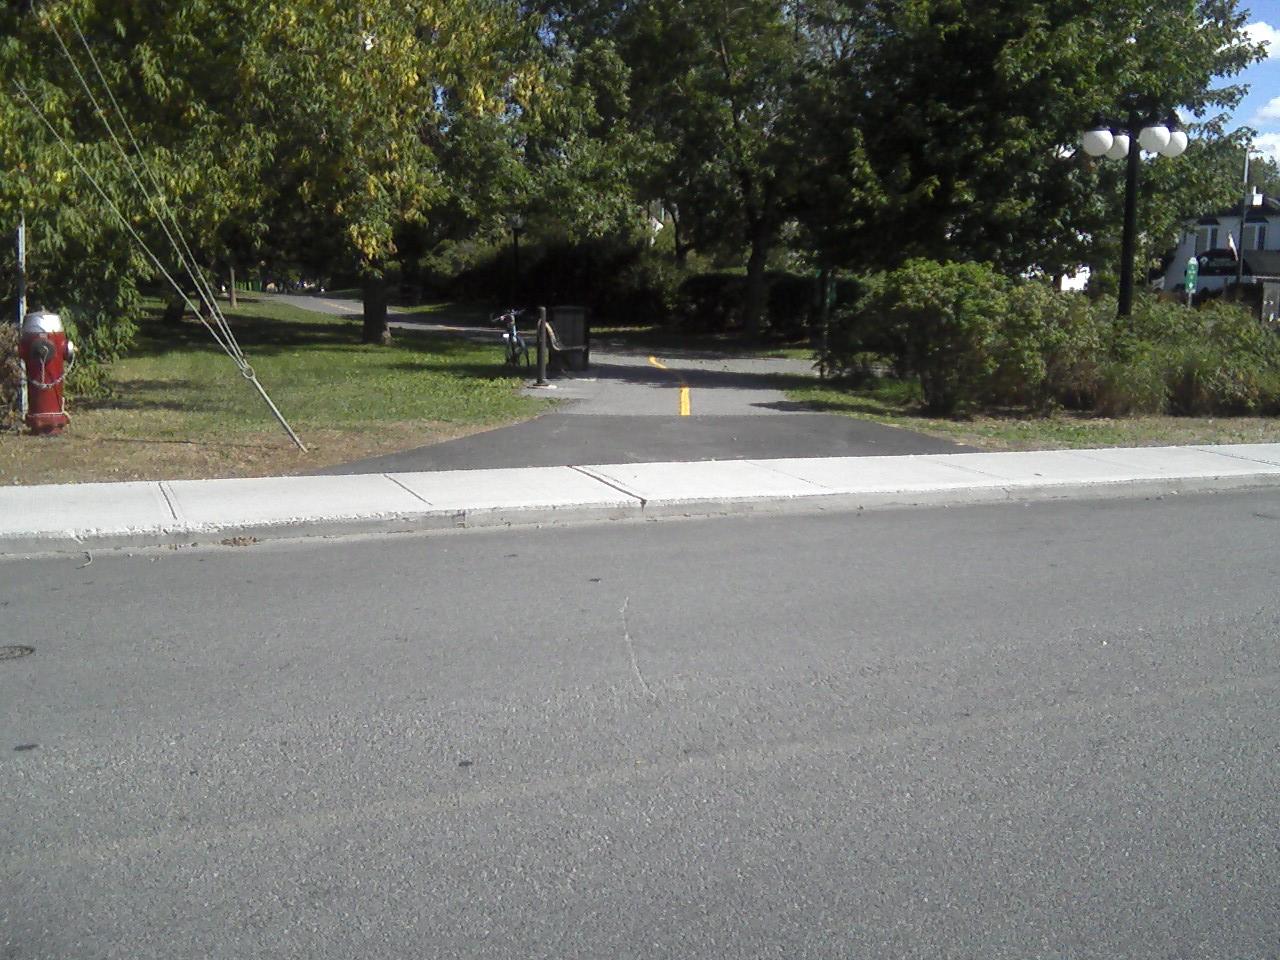 Velotout bordure de trottoir - Bordure de trottoir ...